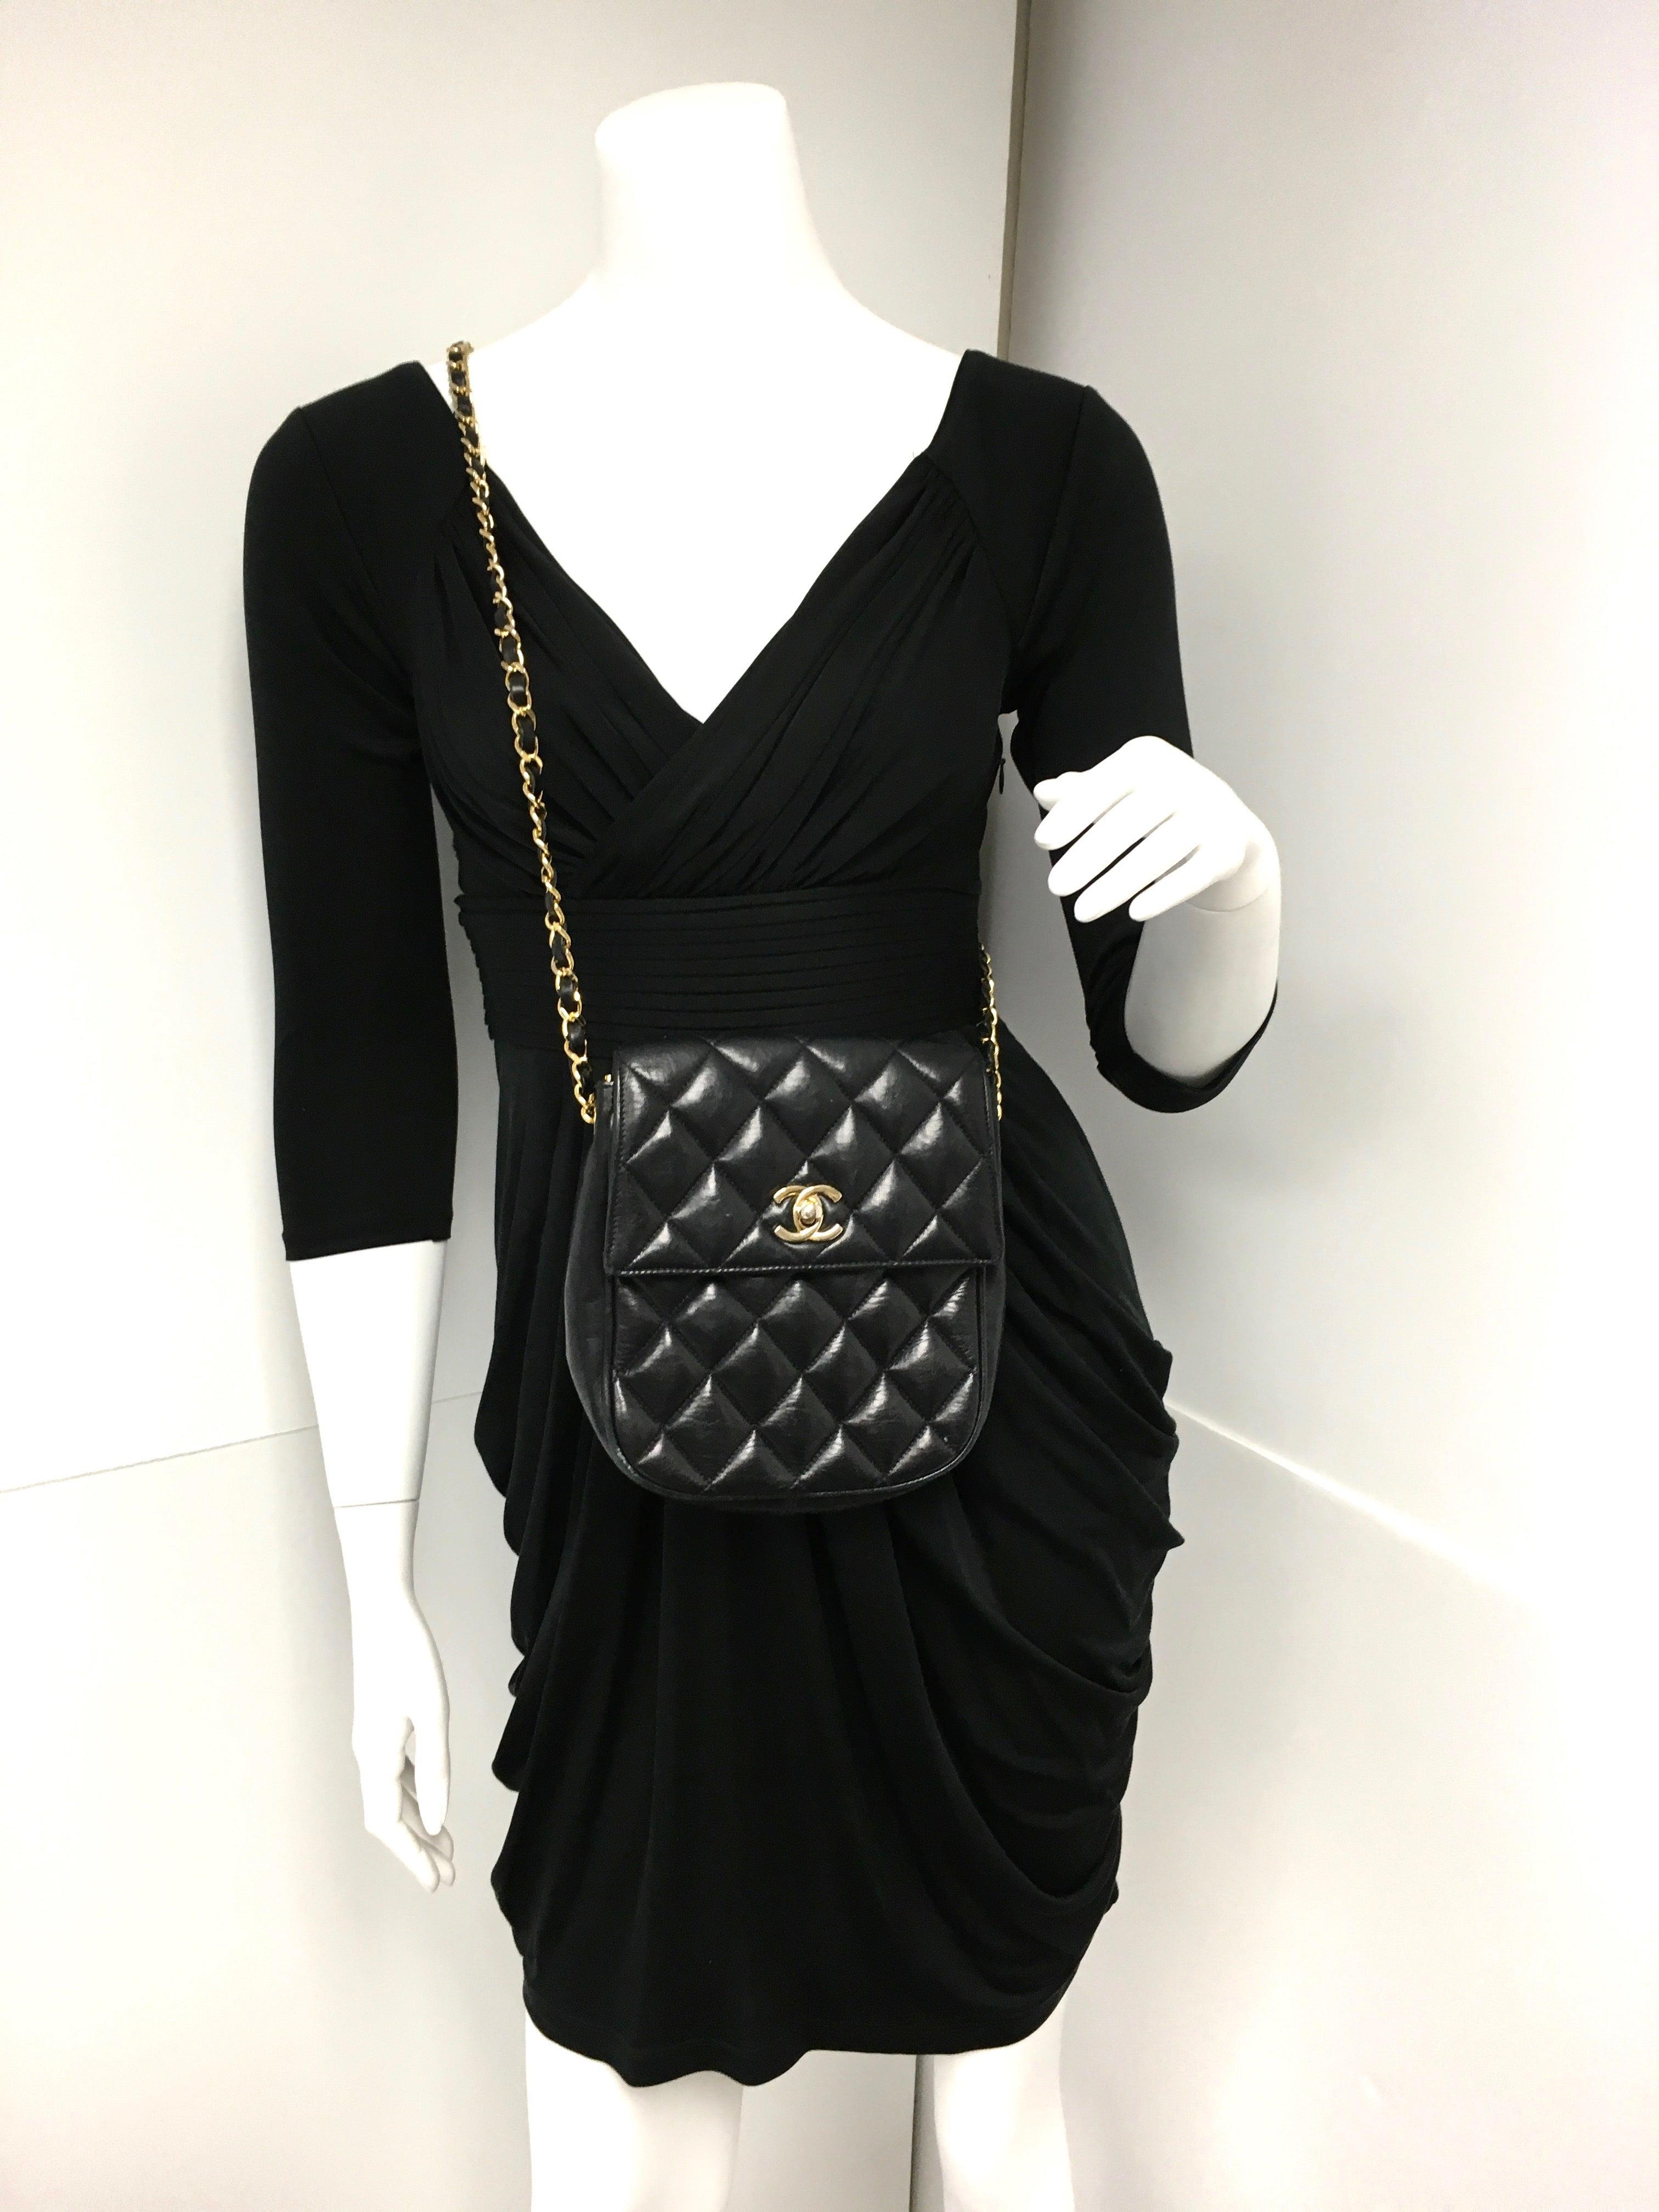 fcf40bad Vintage Chanel Black Lambskin Leather Mini Cross Body Flap Bag at 1stdibs